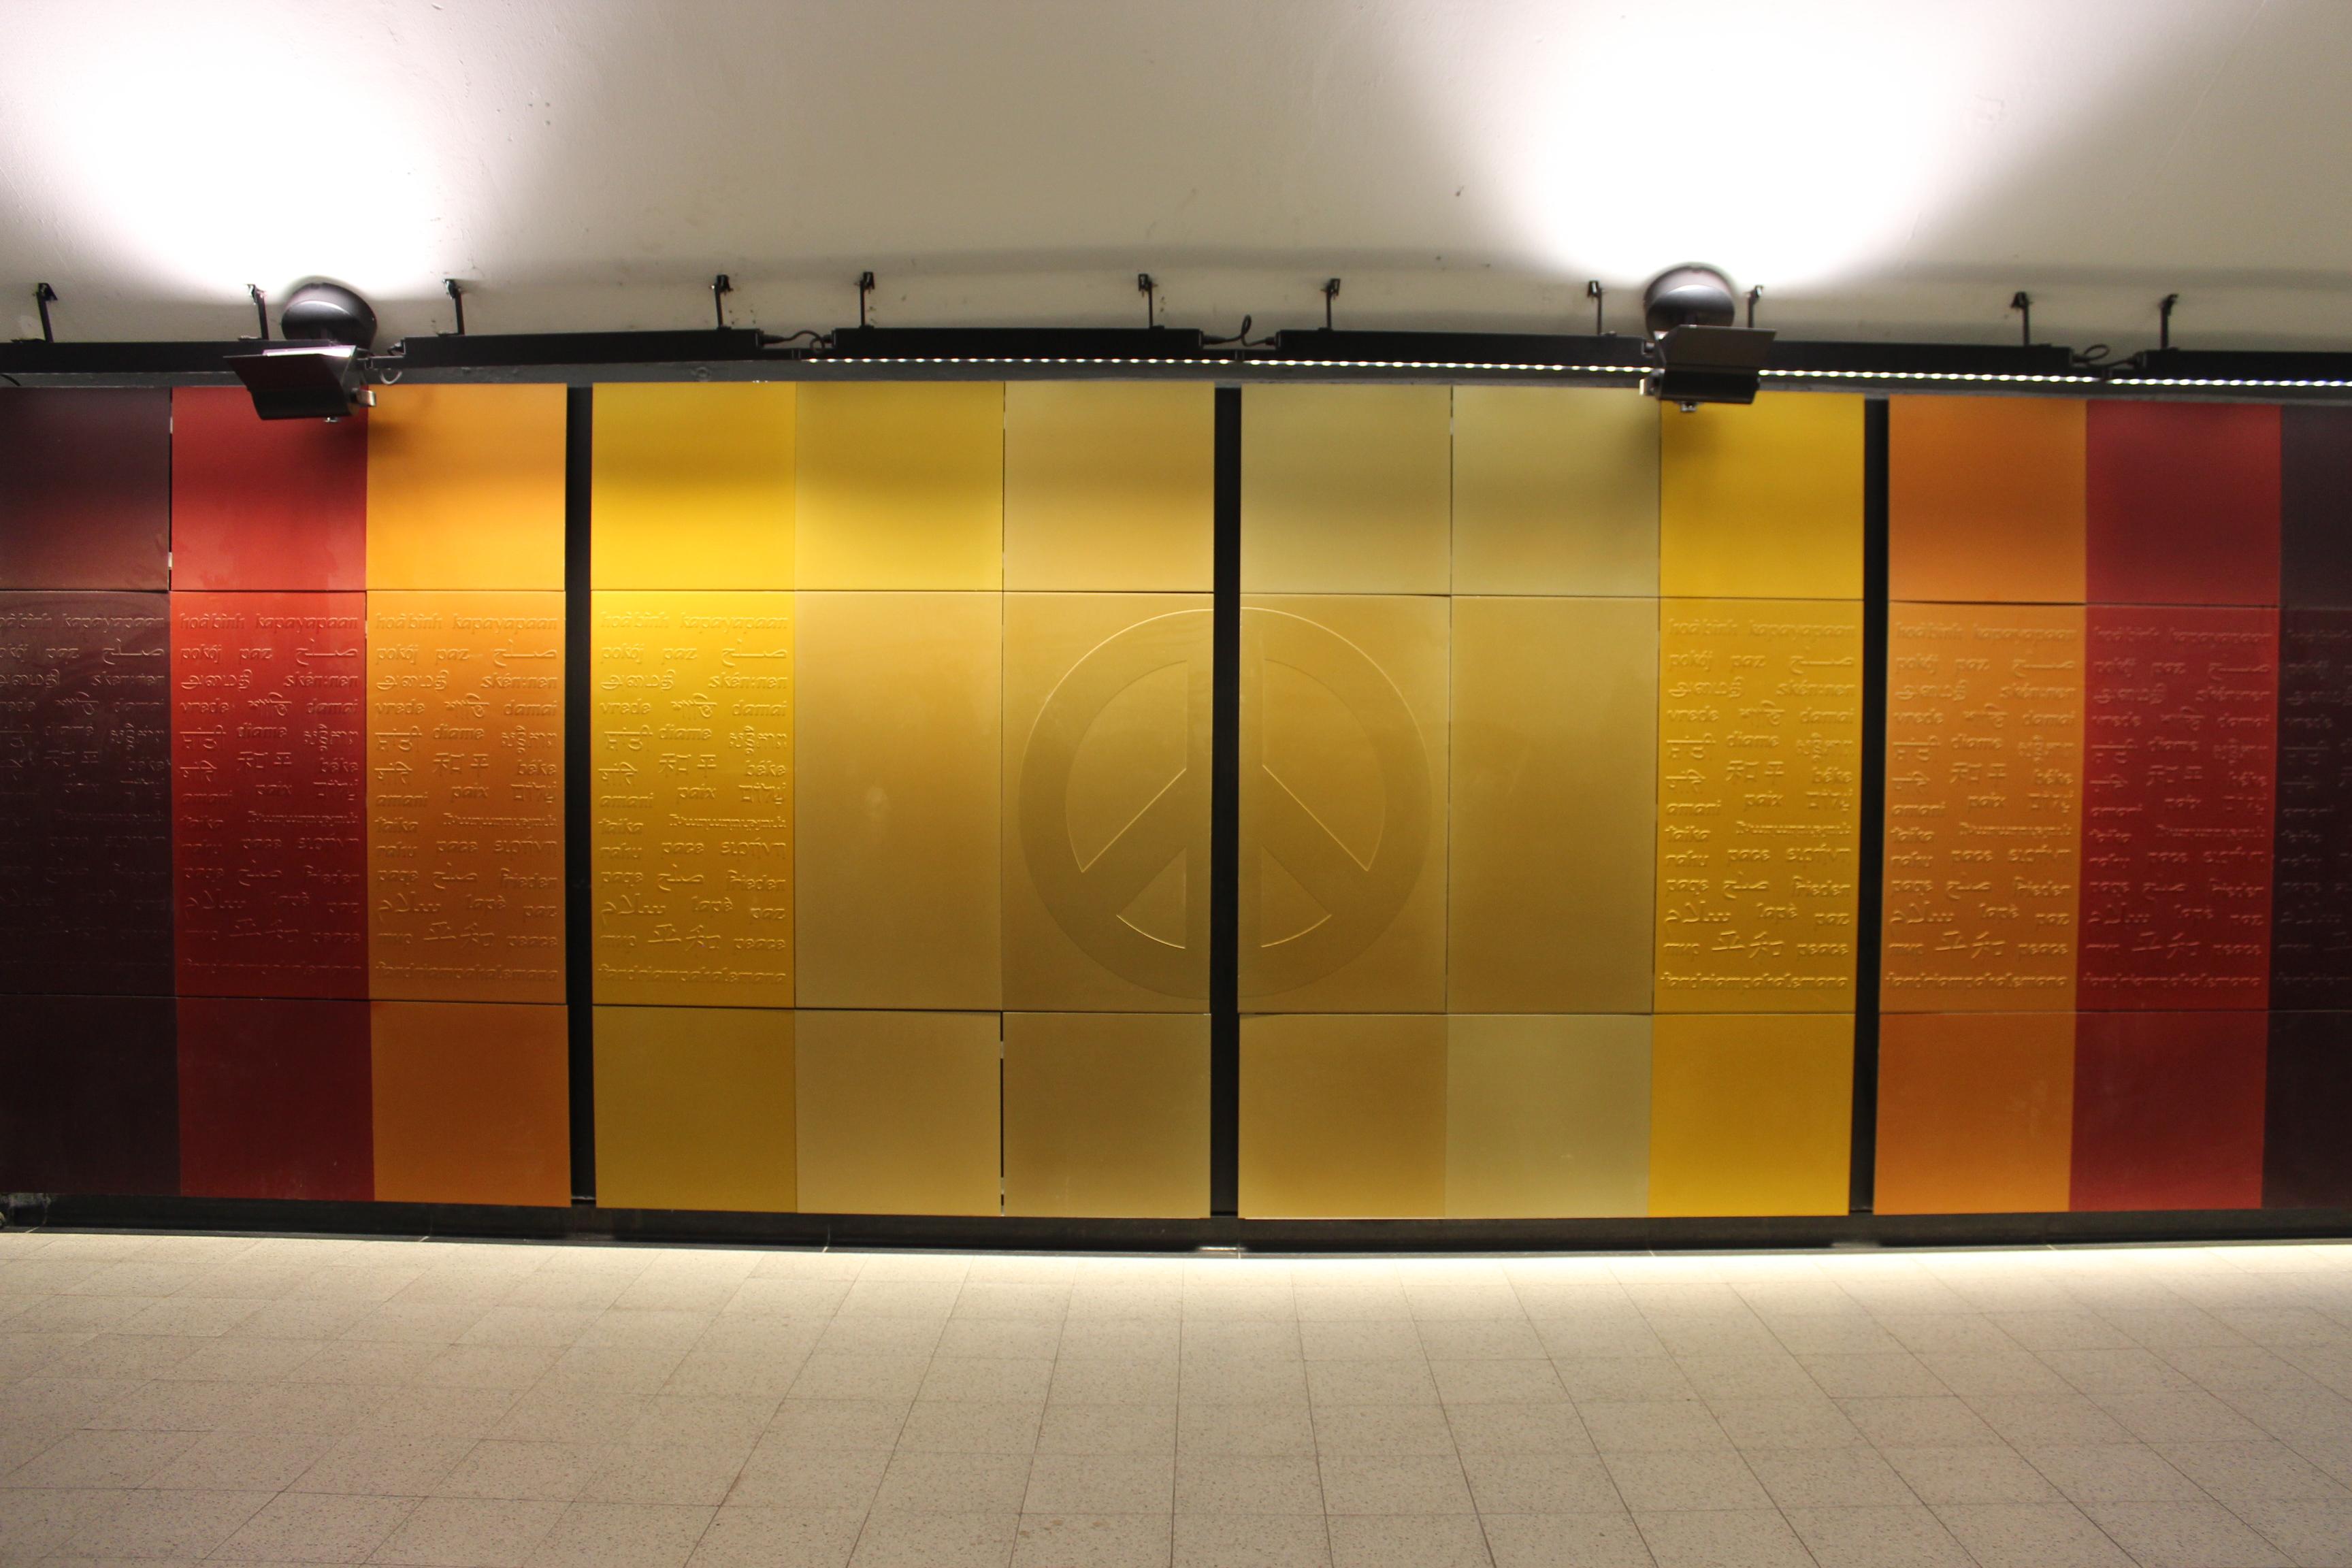 fileberriuqam peace wall artwork montreal metro  wikimedia  - fileberriuqam peace wall artwork montreal metro